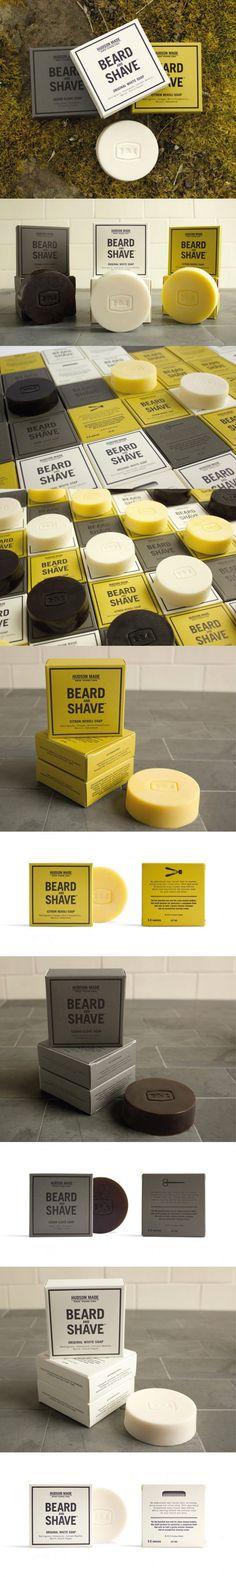 Unique Packaging Design on the Internet, Hudson Made Beard & Shave #packaging #packagingdesign